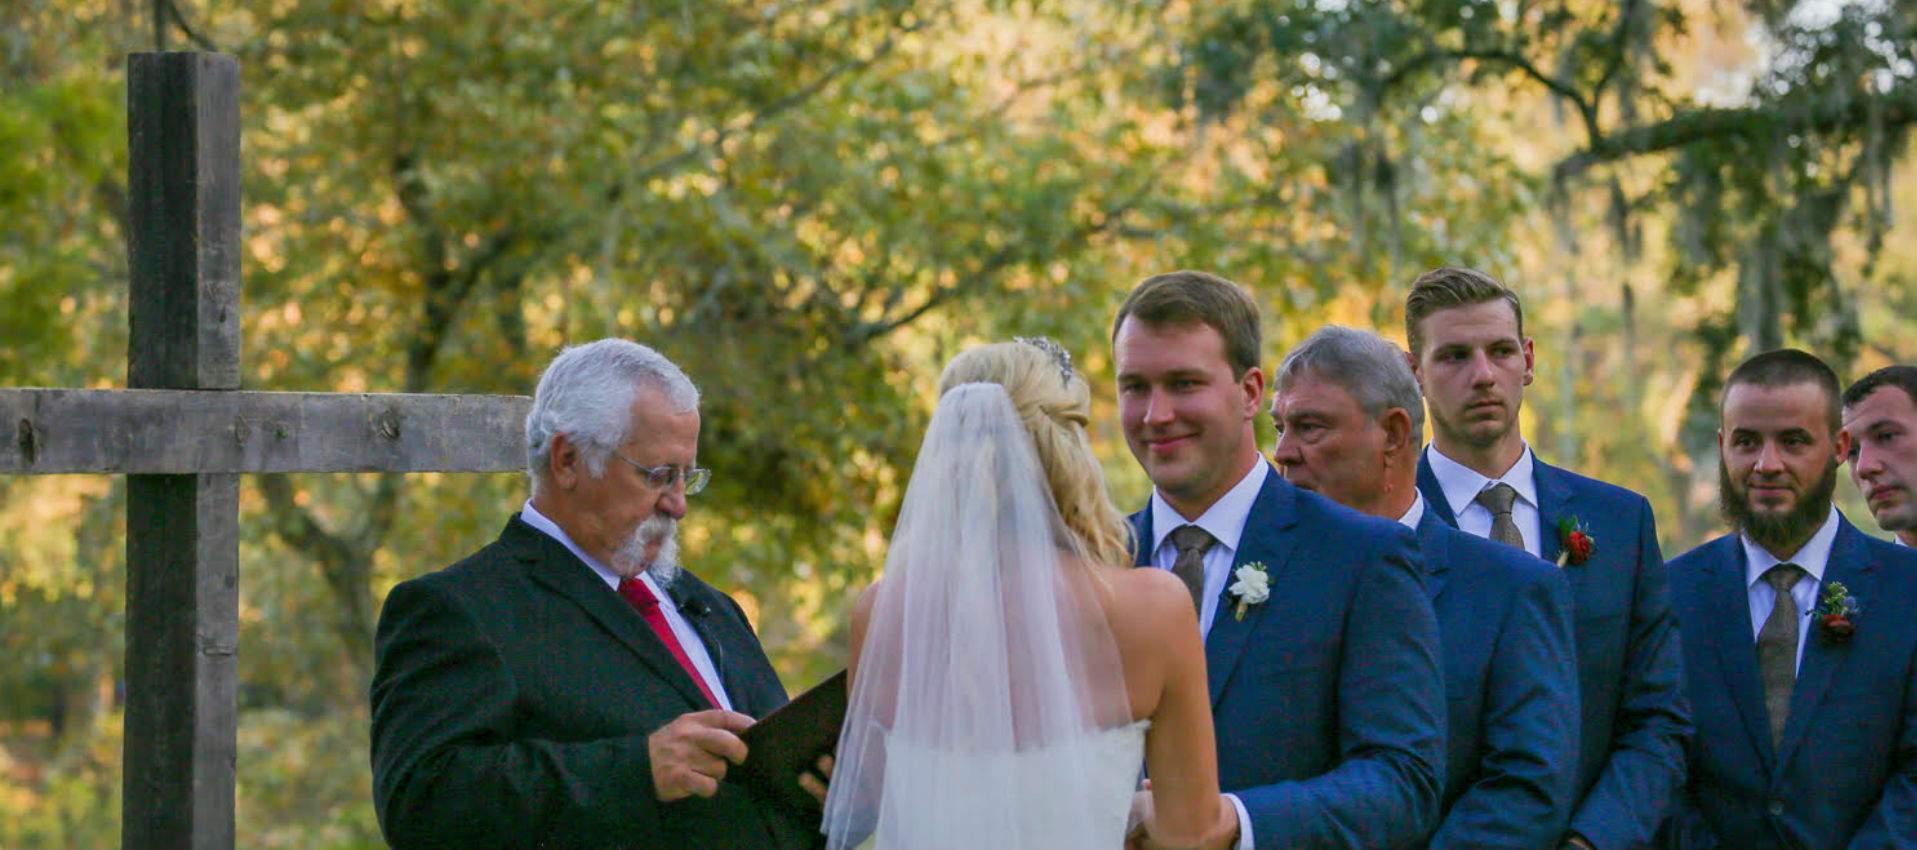 Wedding Photographer - Professional Wedding Photographer in Denver, CO